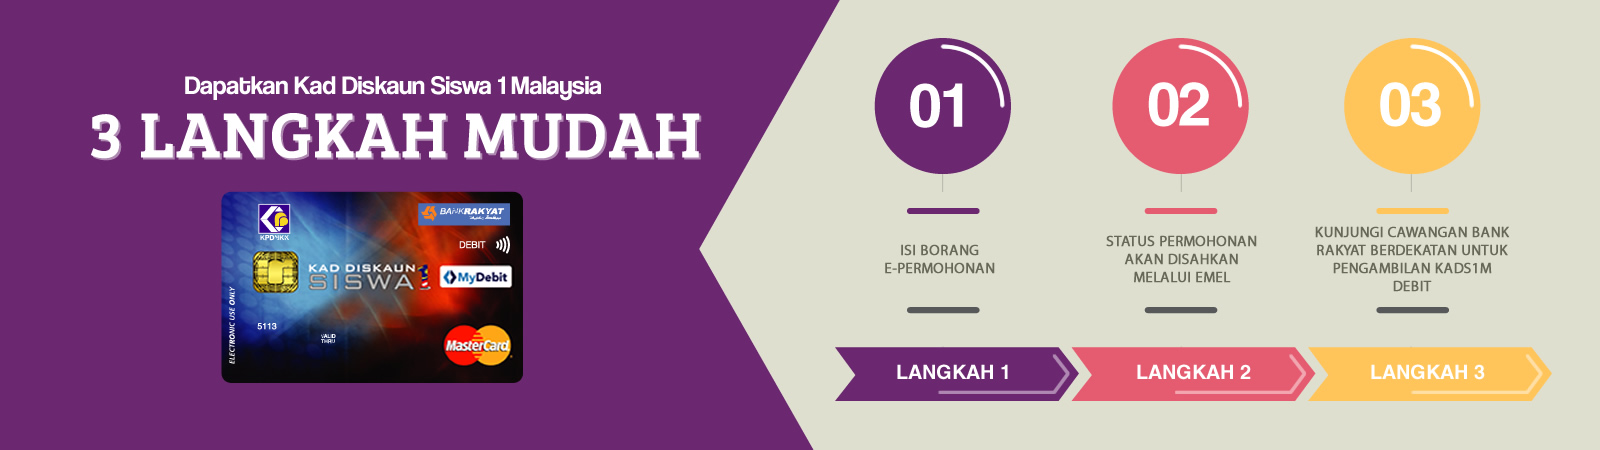 Kad Debit Siswa 1 Malaysia Bank Rakyat 2017